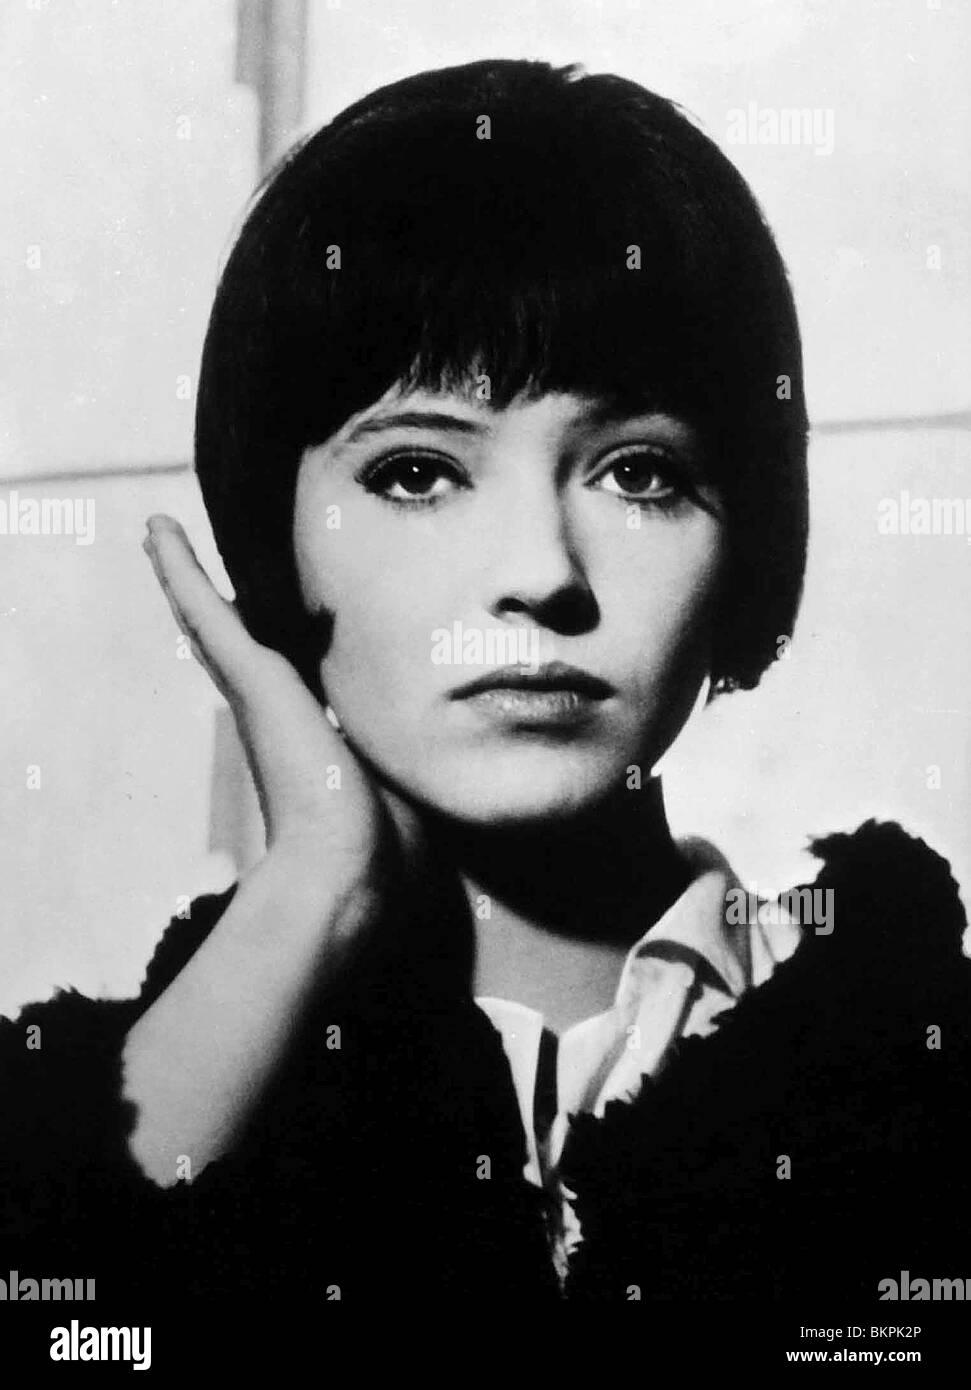 VIVRE SA VIE (1962) IT'S MY LIFE (ALT) MY LIFE TO LIVE (ALT) ANNA KARINA JEAN-LUC GODARD (DIR) VIVR 001 - Stock Image